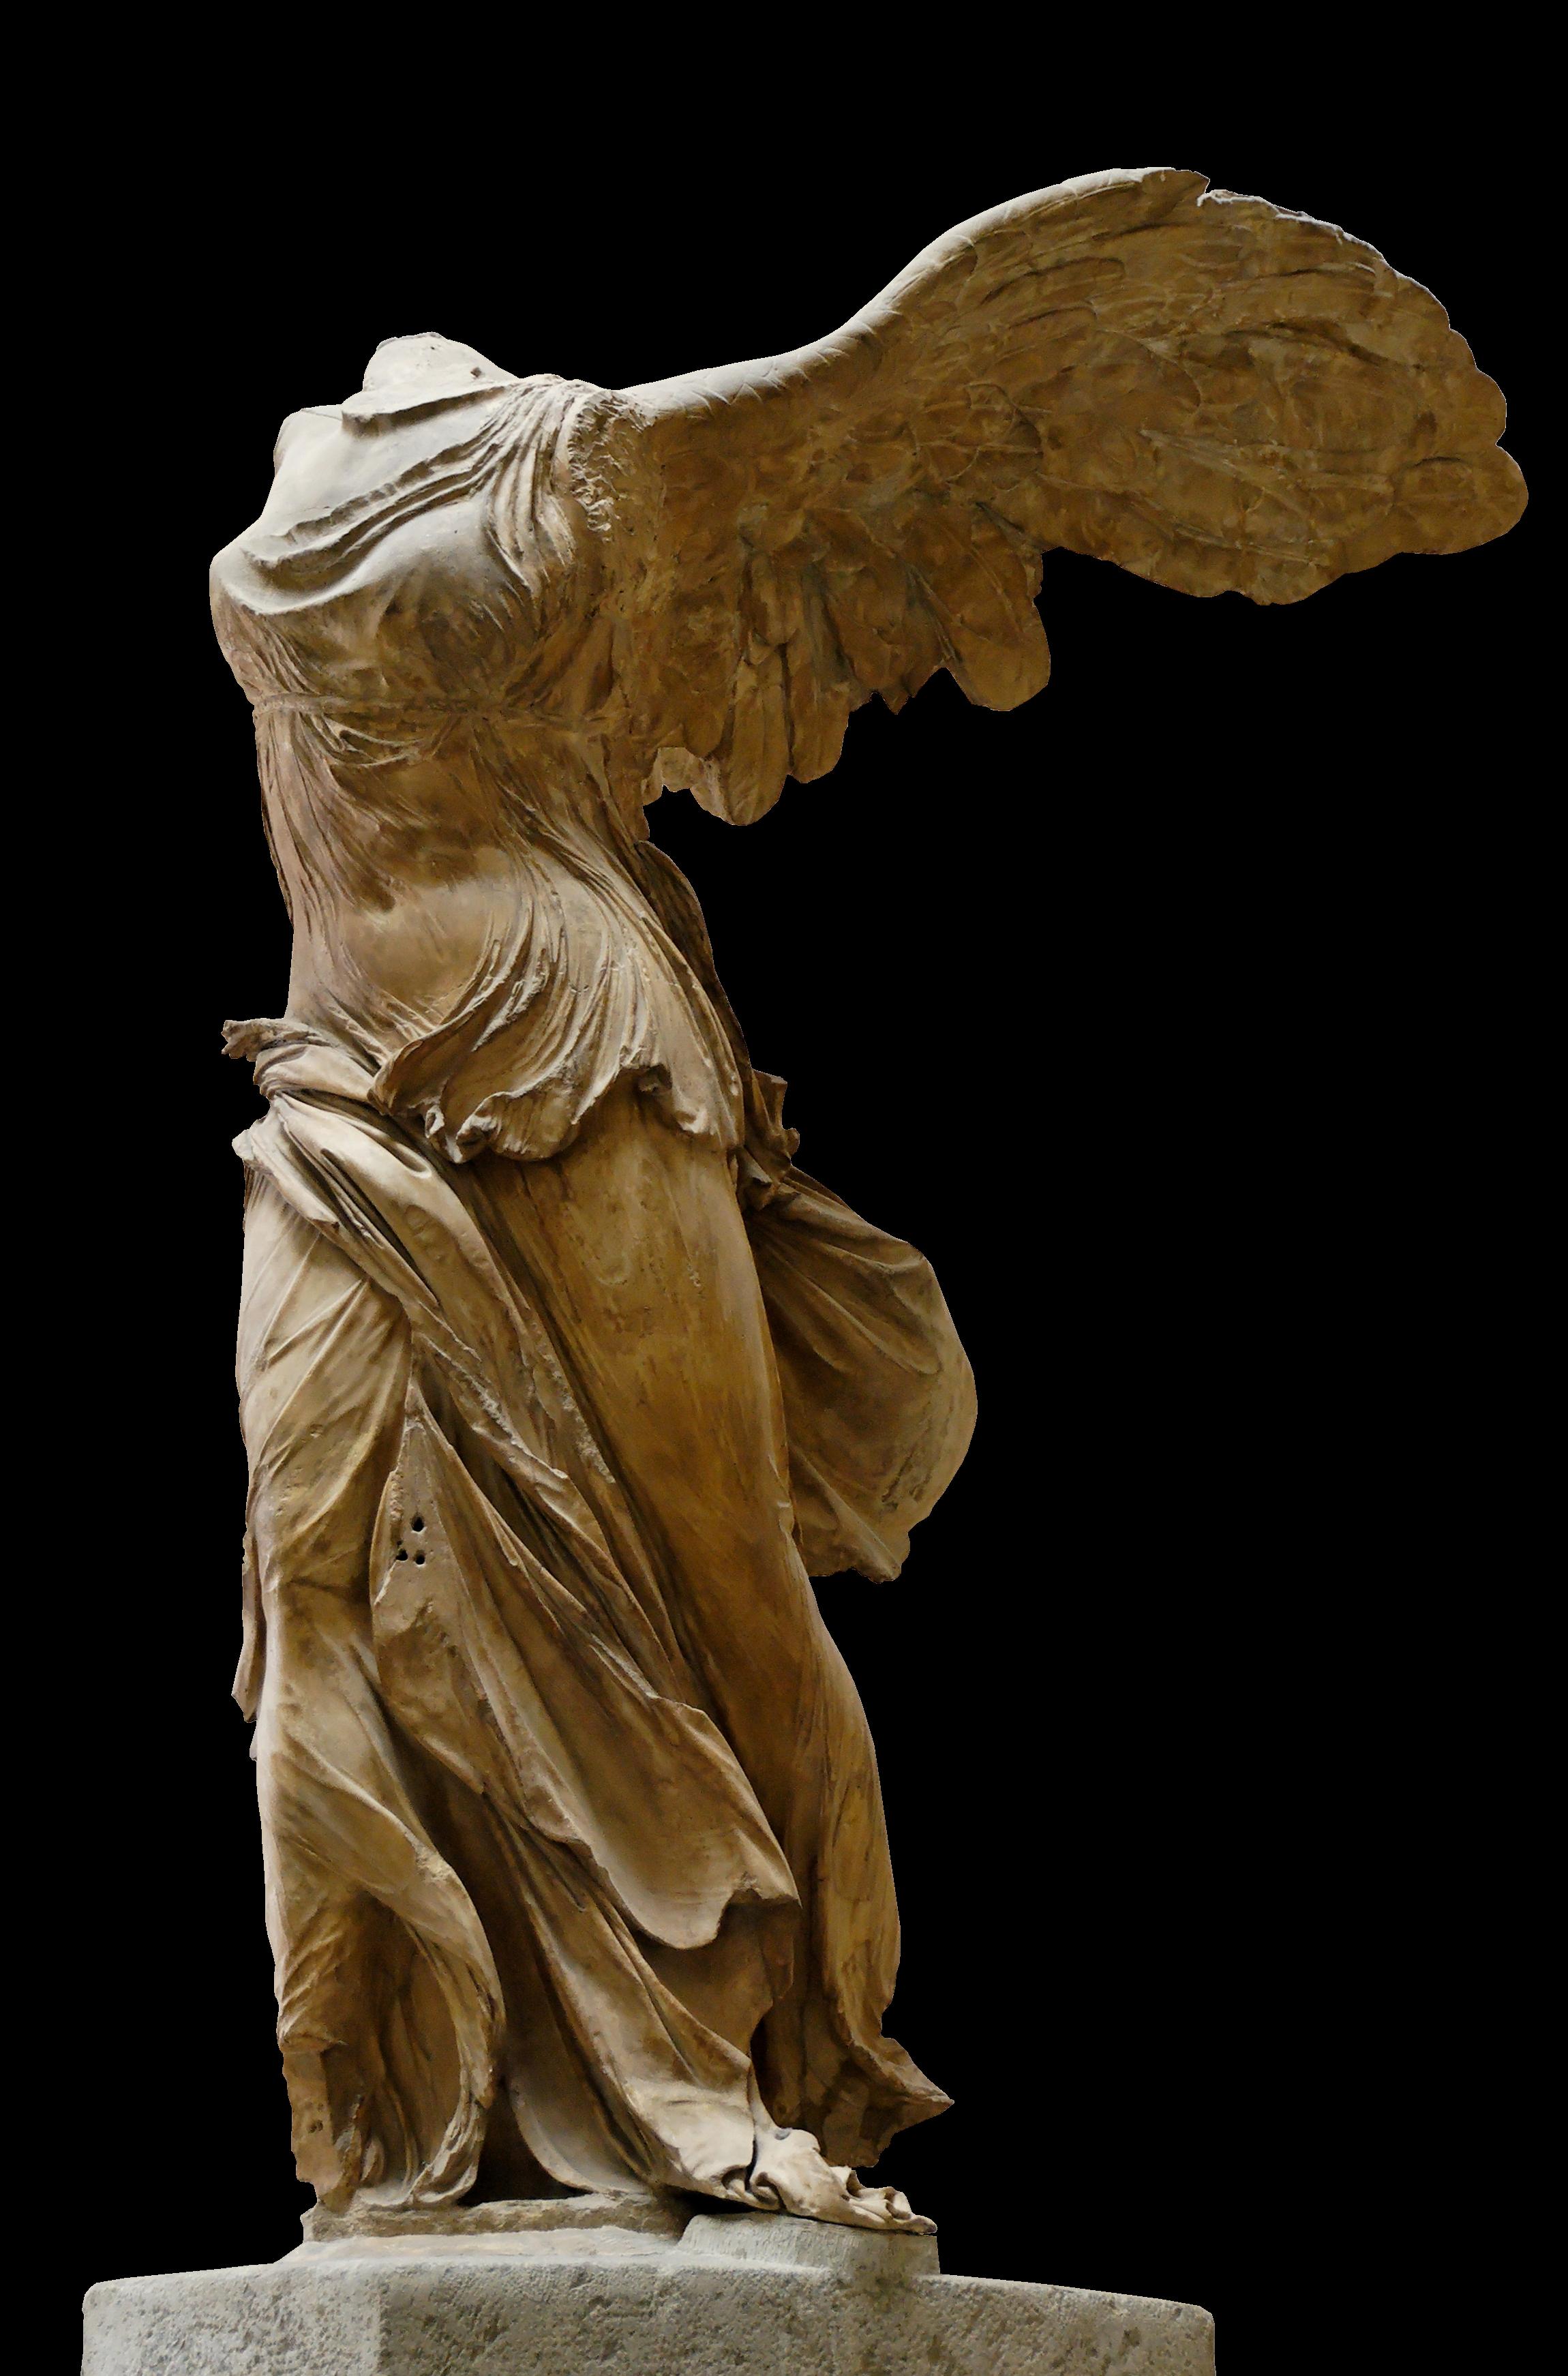 Soldado Ondular Desplazamiento  File:Nike of Samothrake Louvre Ma2369 n4.png - Wikimedia Commons